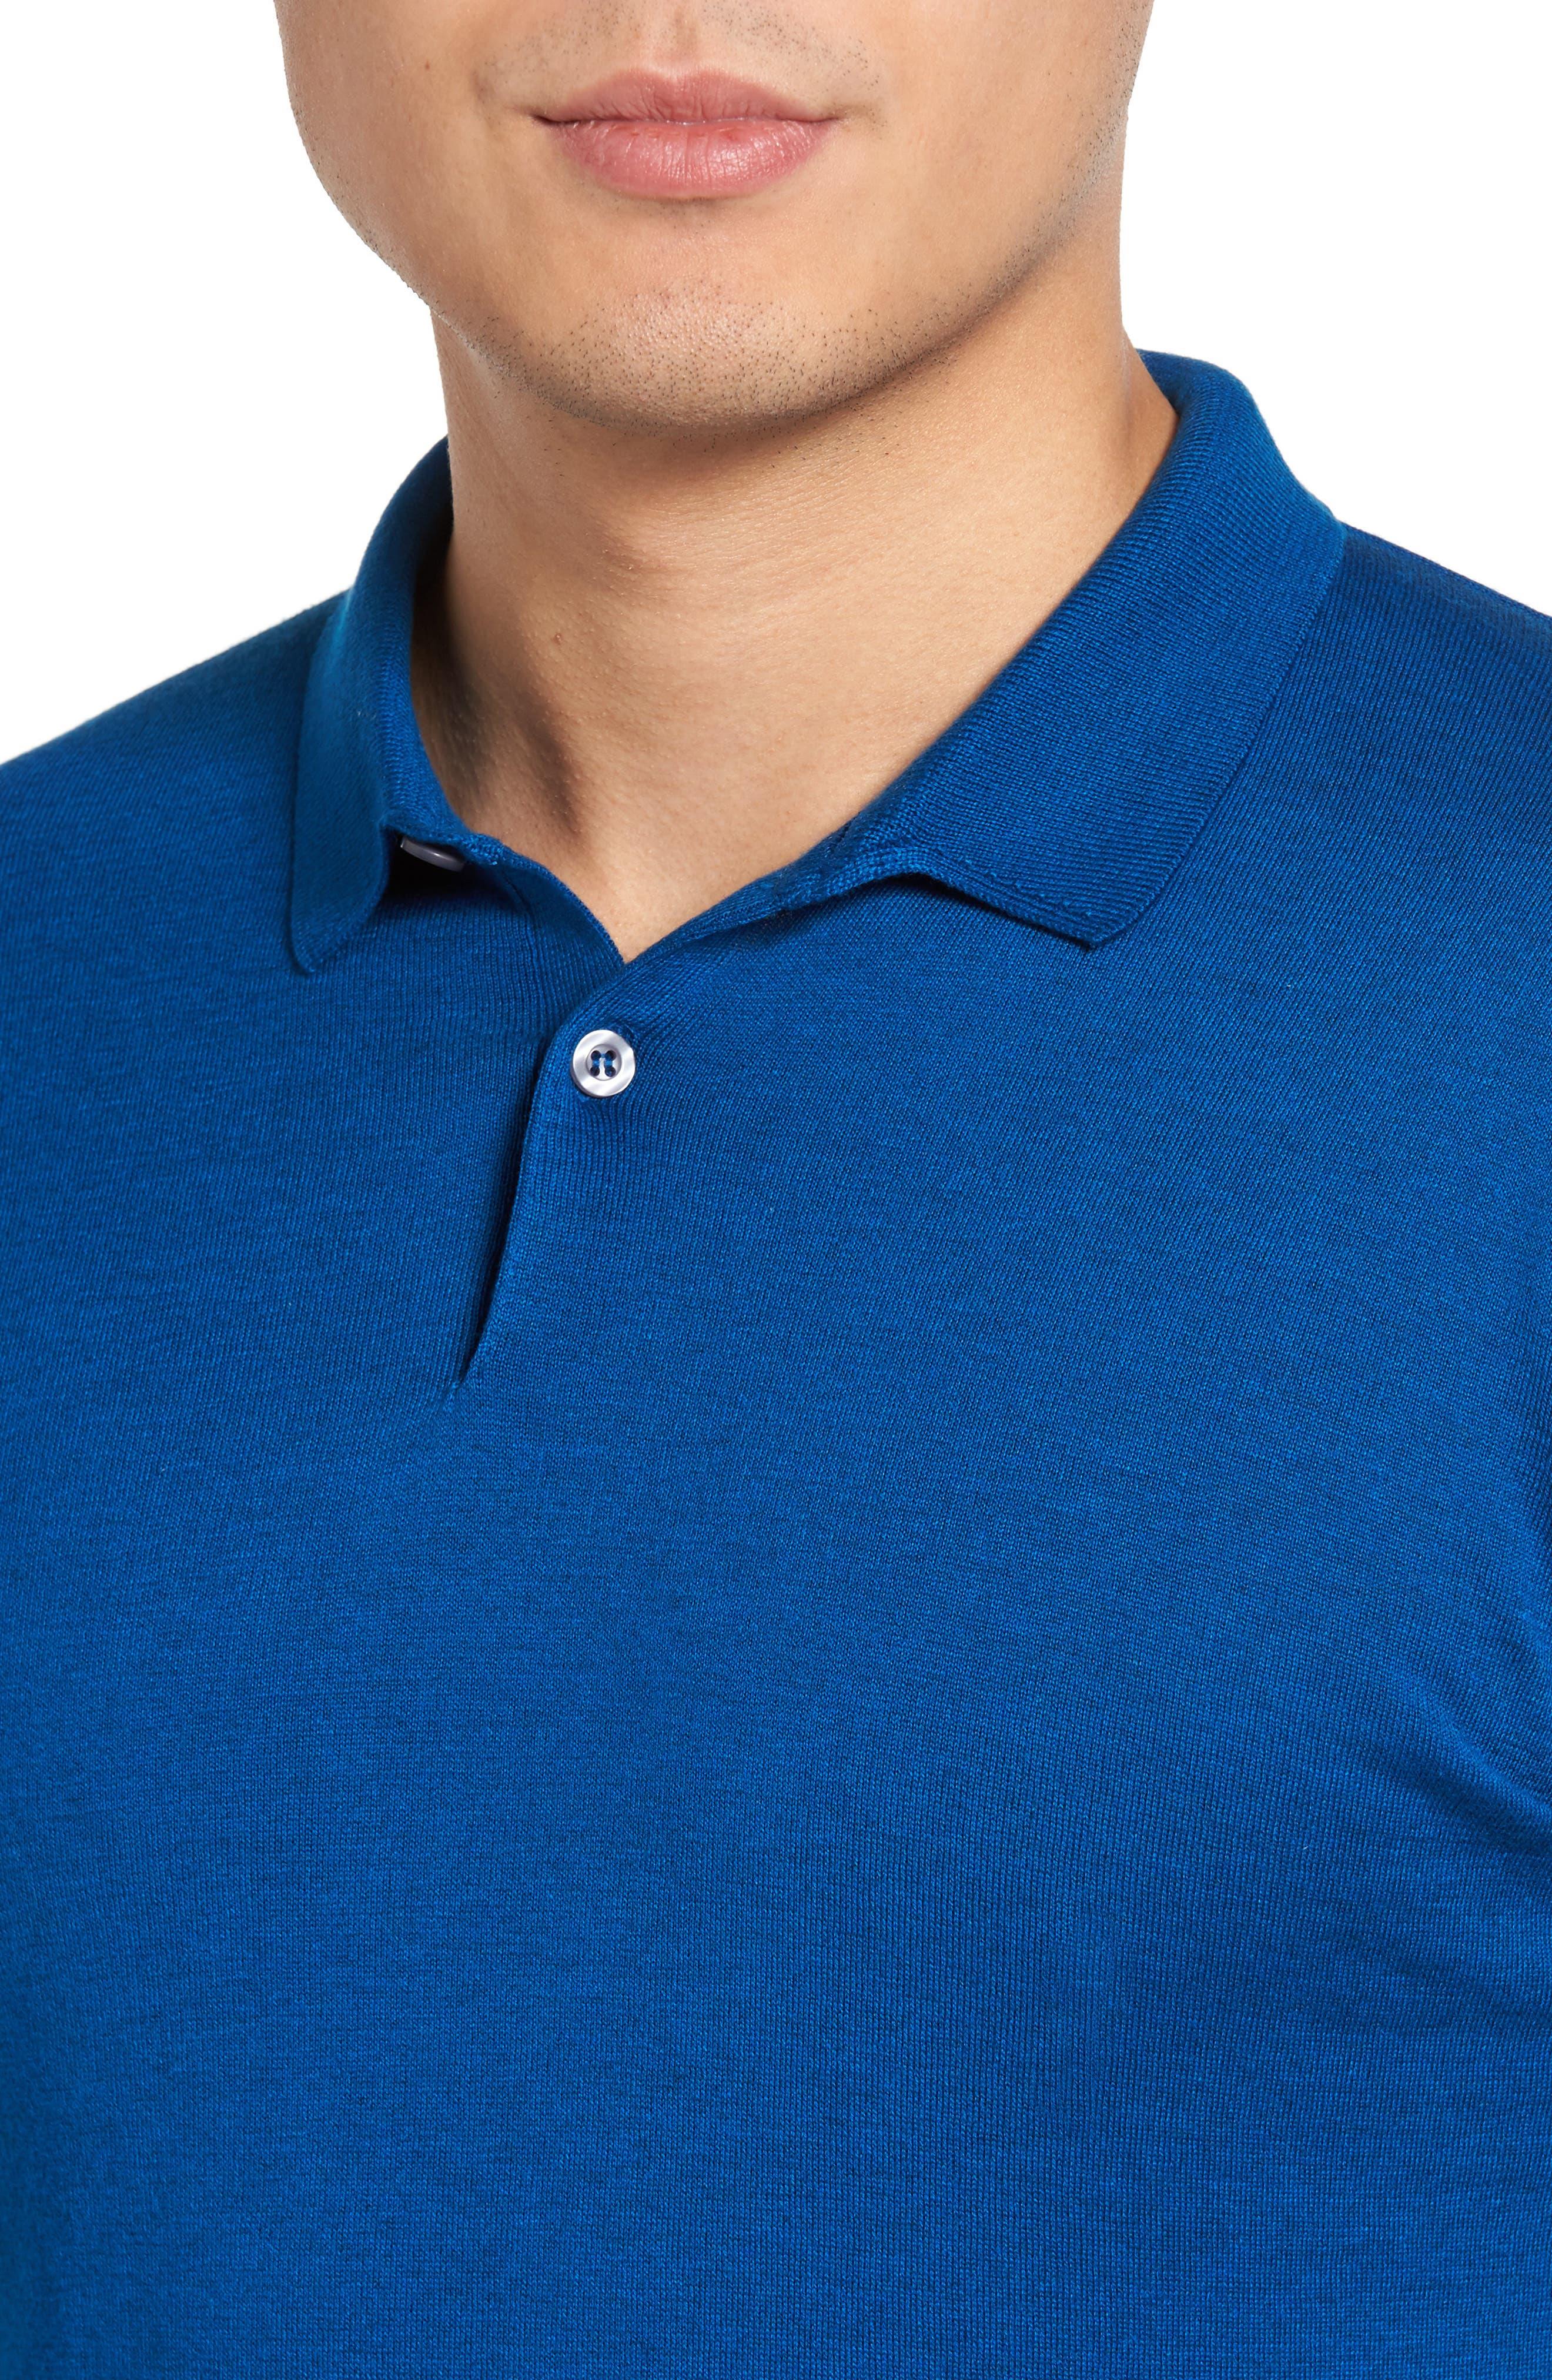 Seal Island Cotton Polo,                             Alternate thumbnail 4, color,                             Stevens Blue